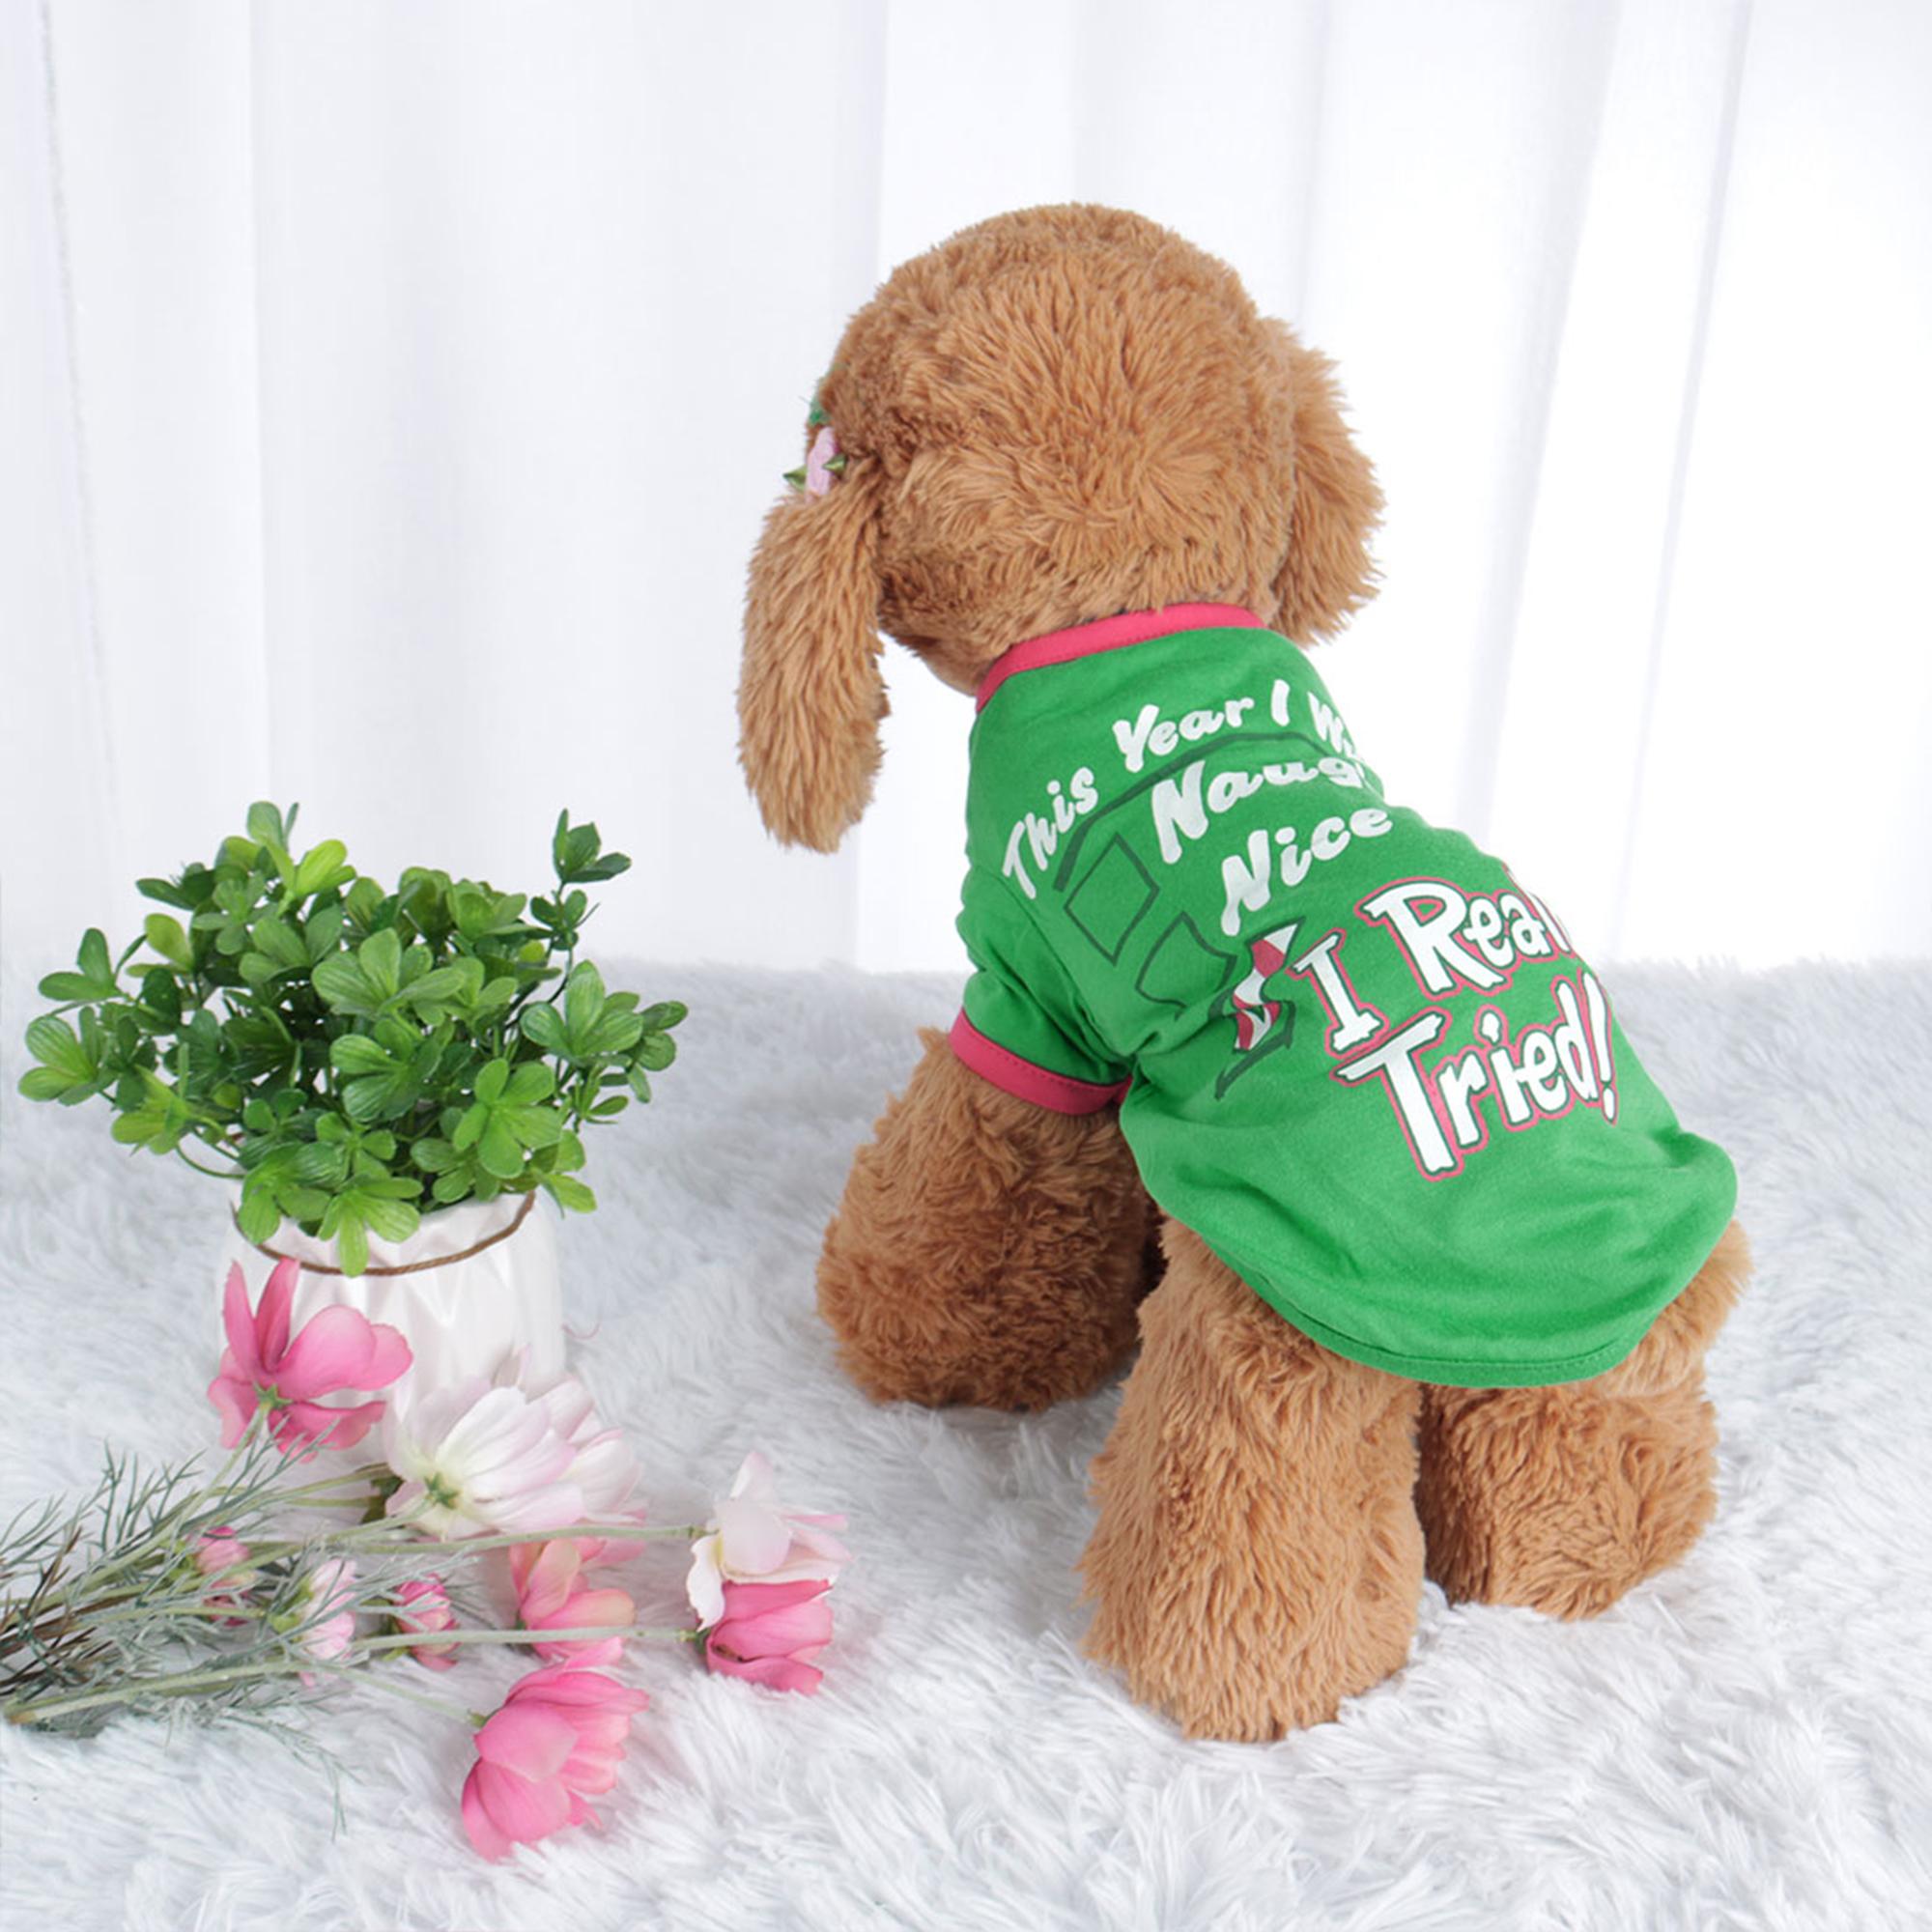 Dog T Shirt Puppy Small Pet Sweatshirt Tops Clothes Apparel Vest Costume #2, L - image 7 of 7